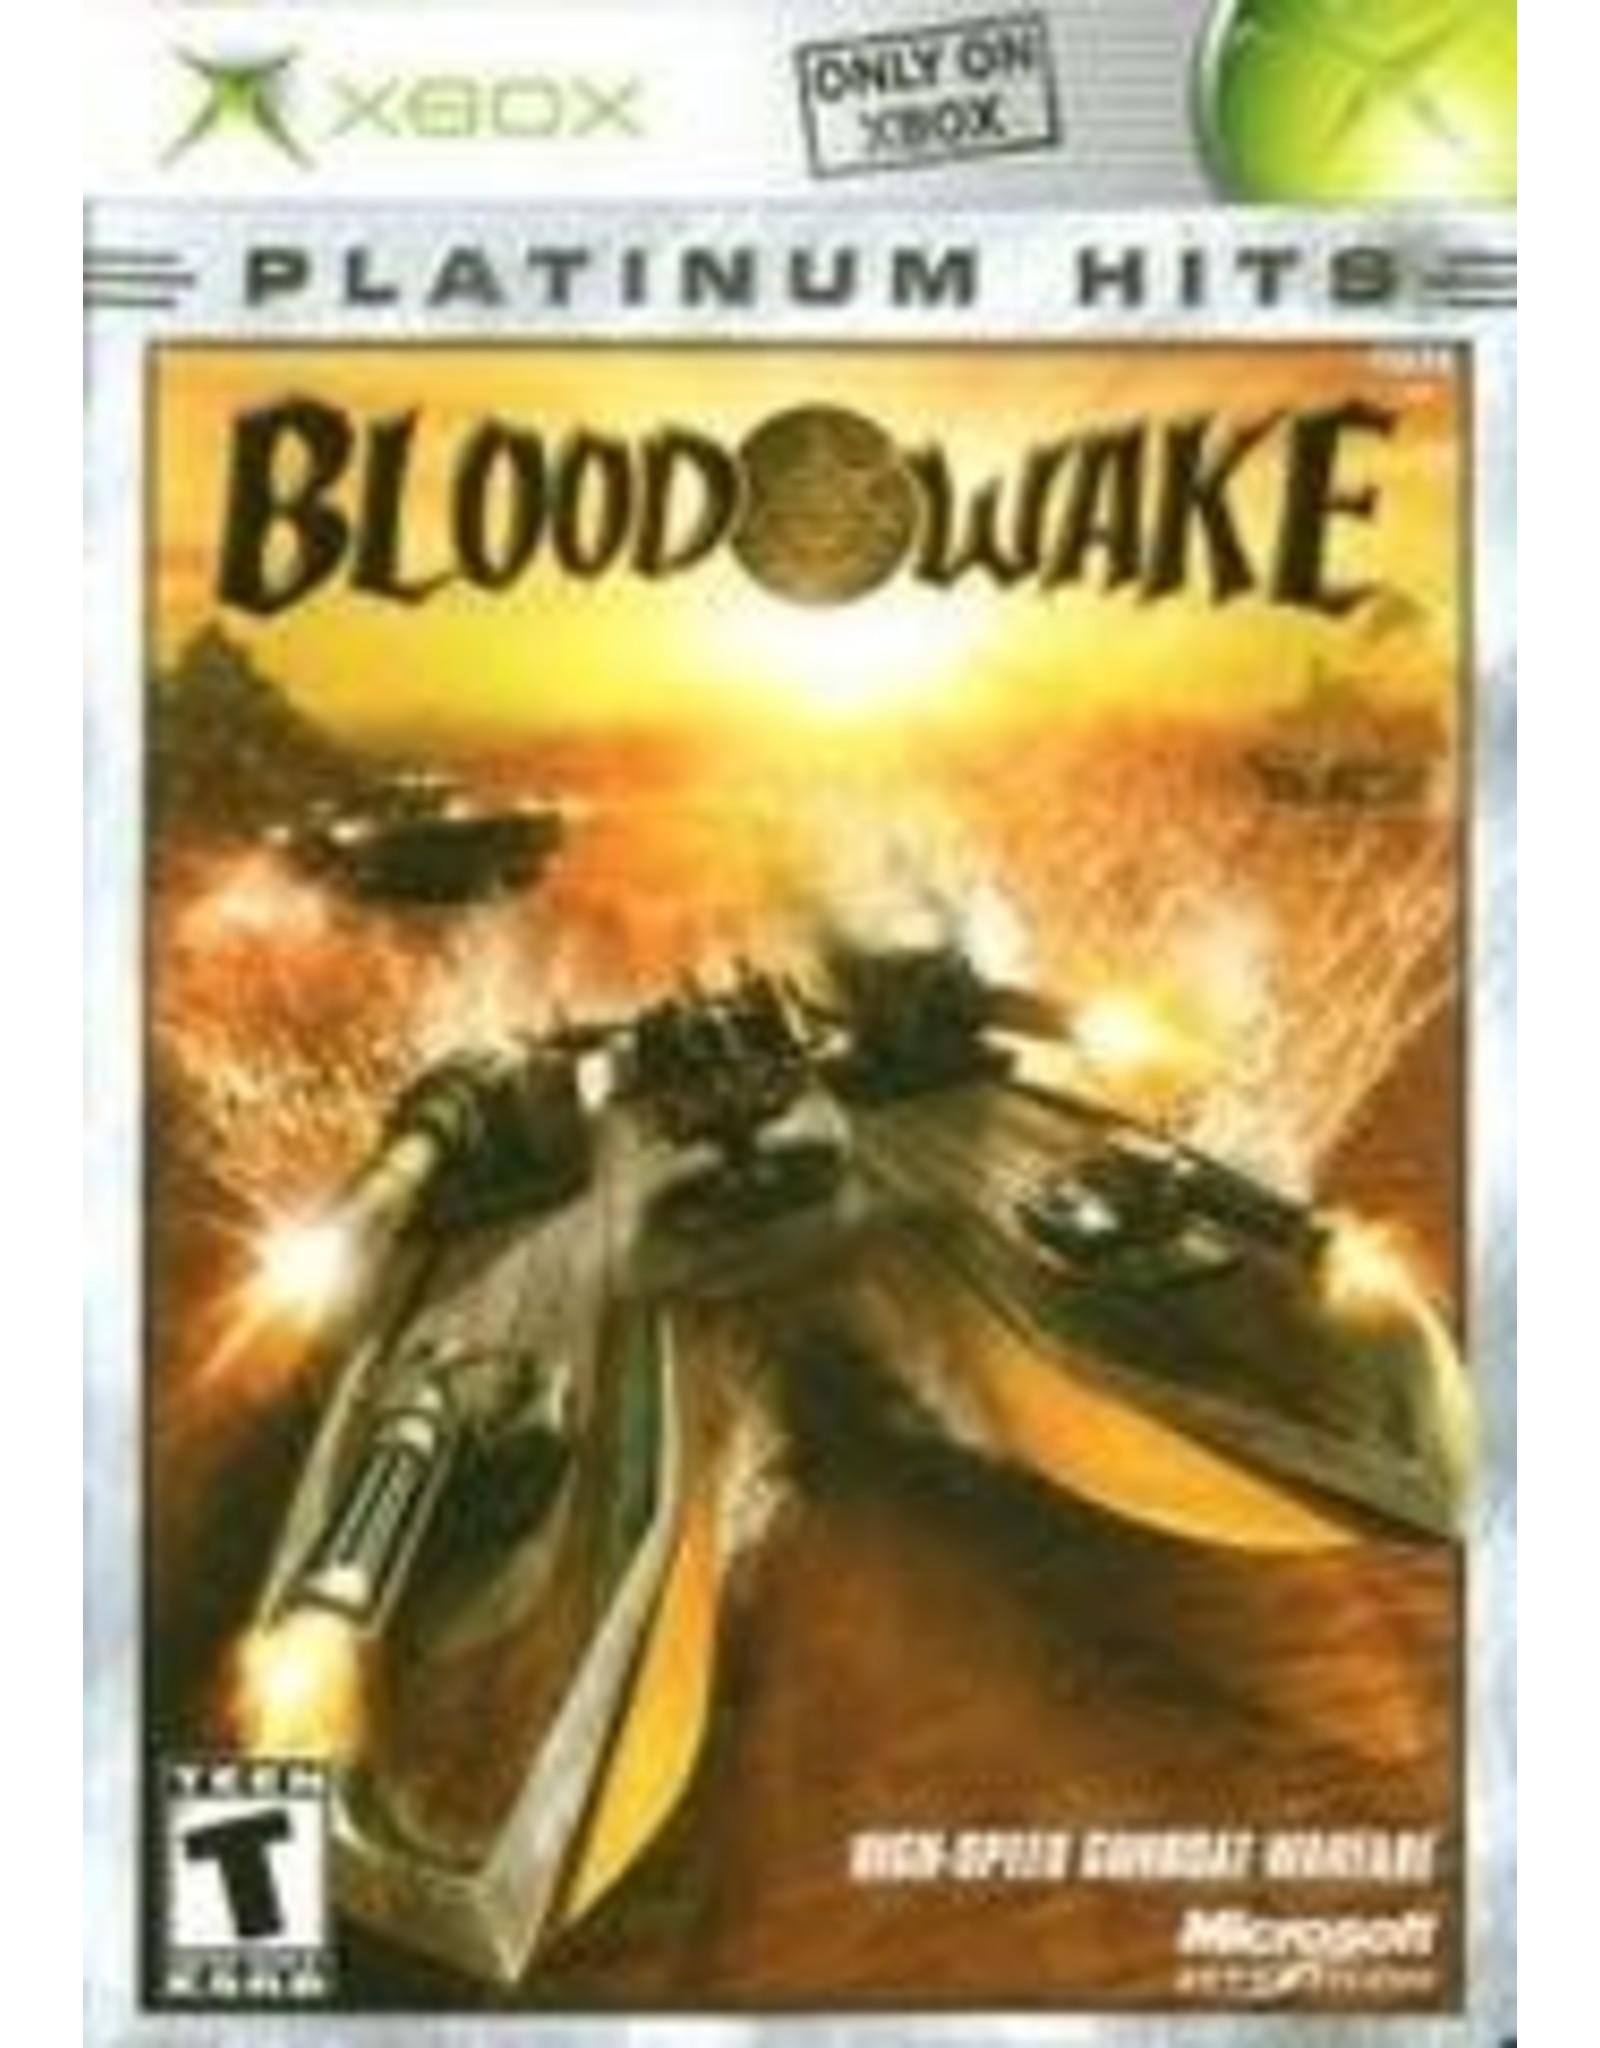 Xbox Blood Wake (Platinum Hits, CiB)